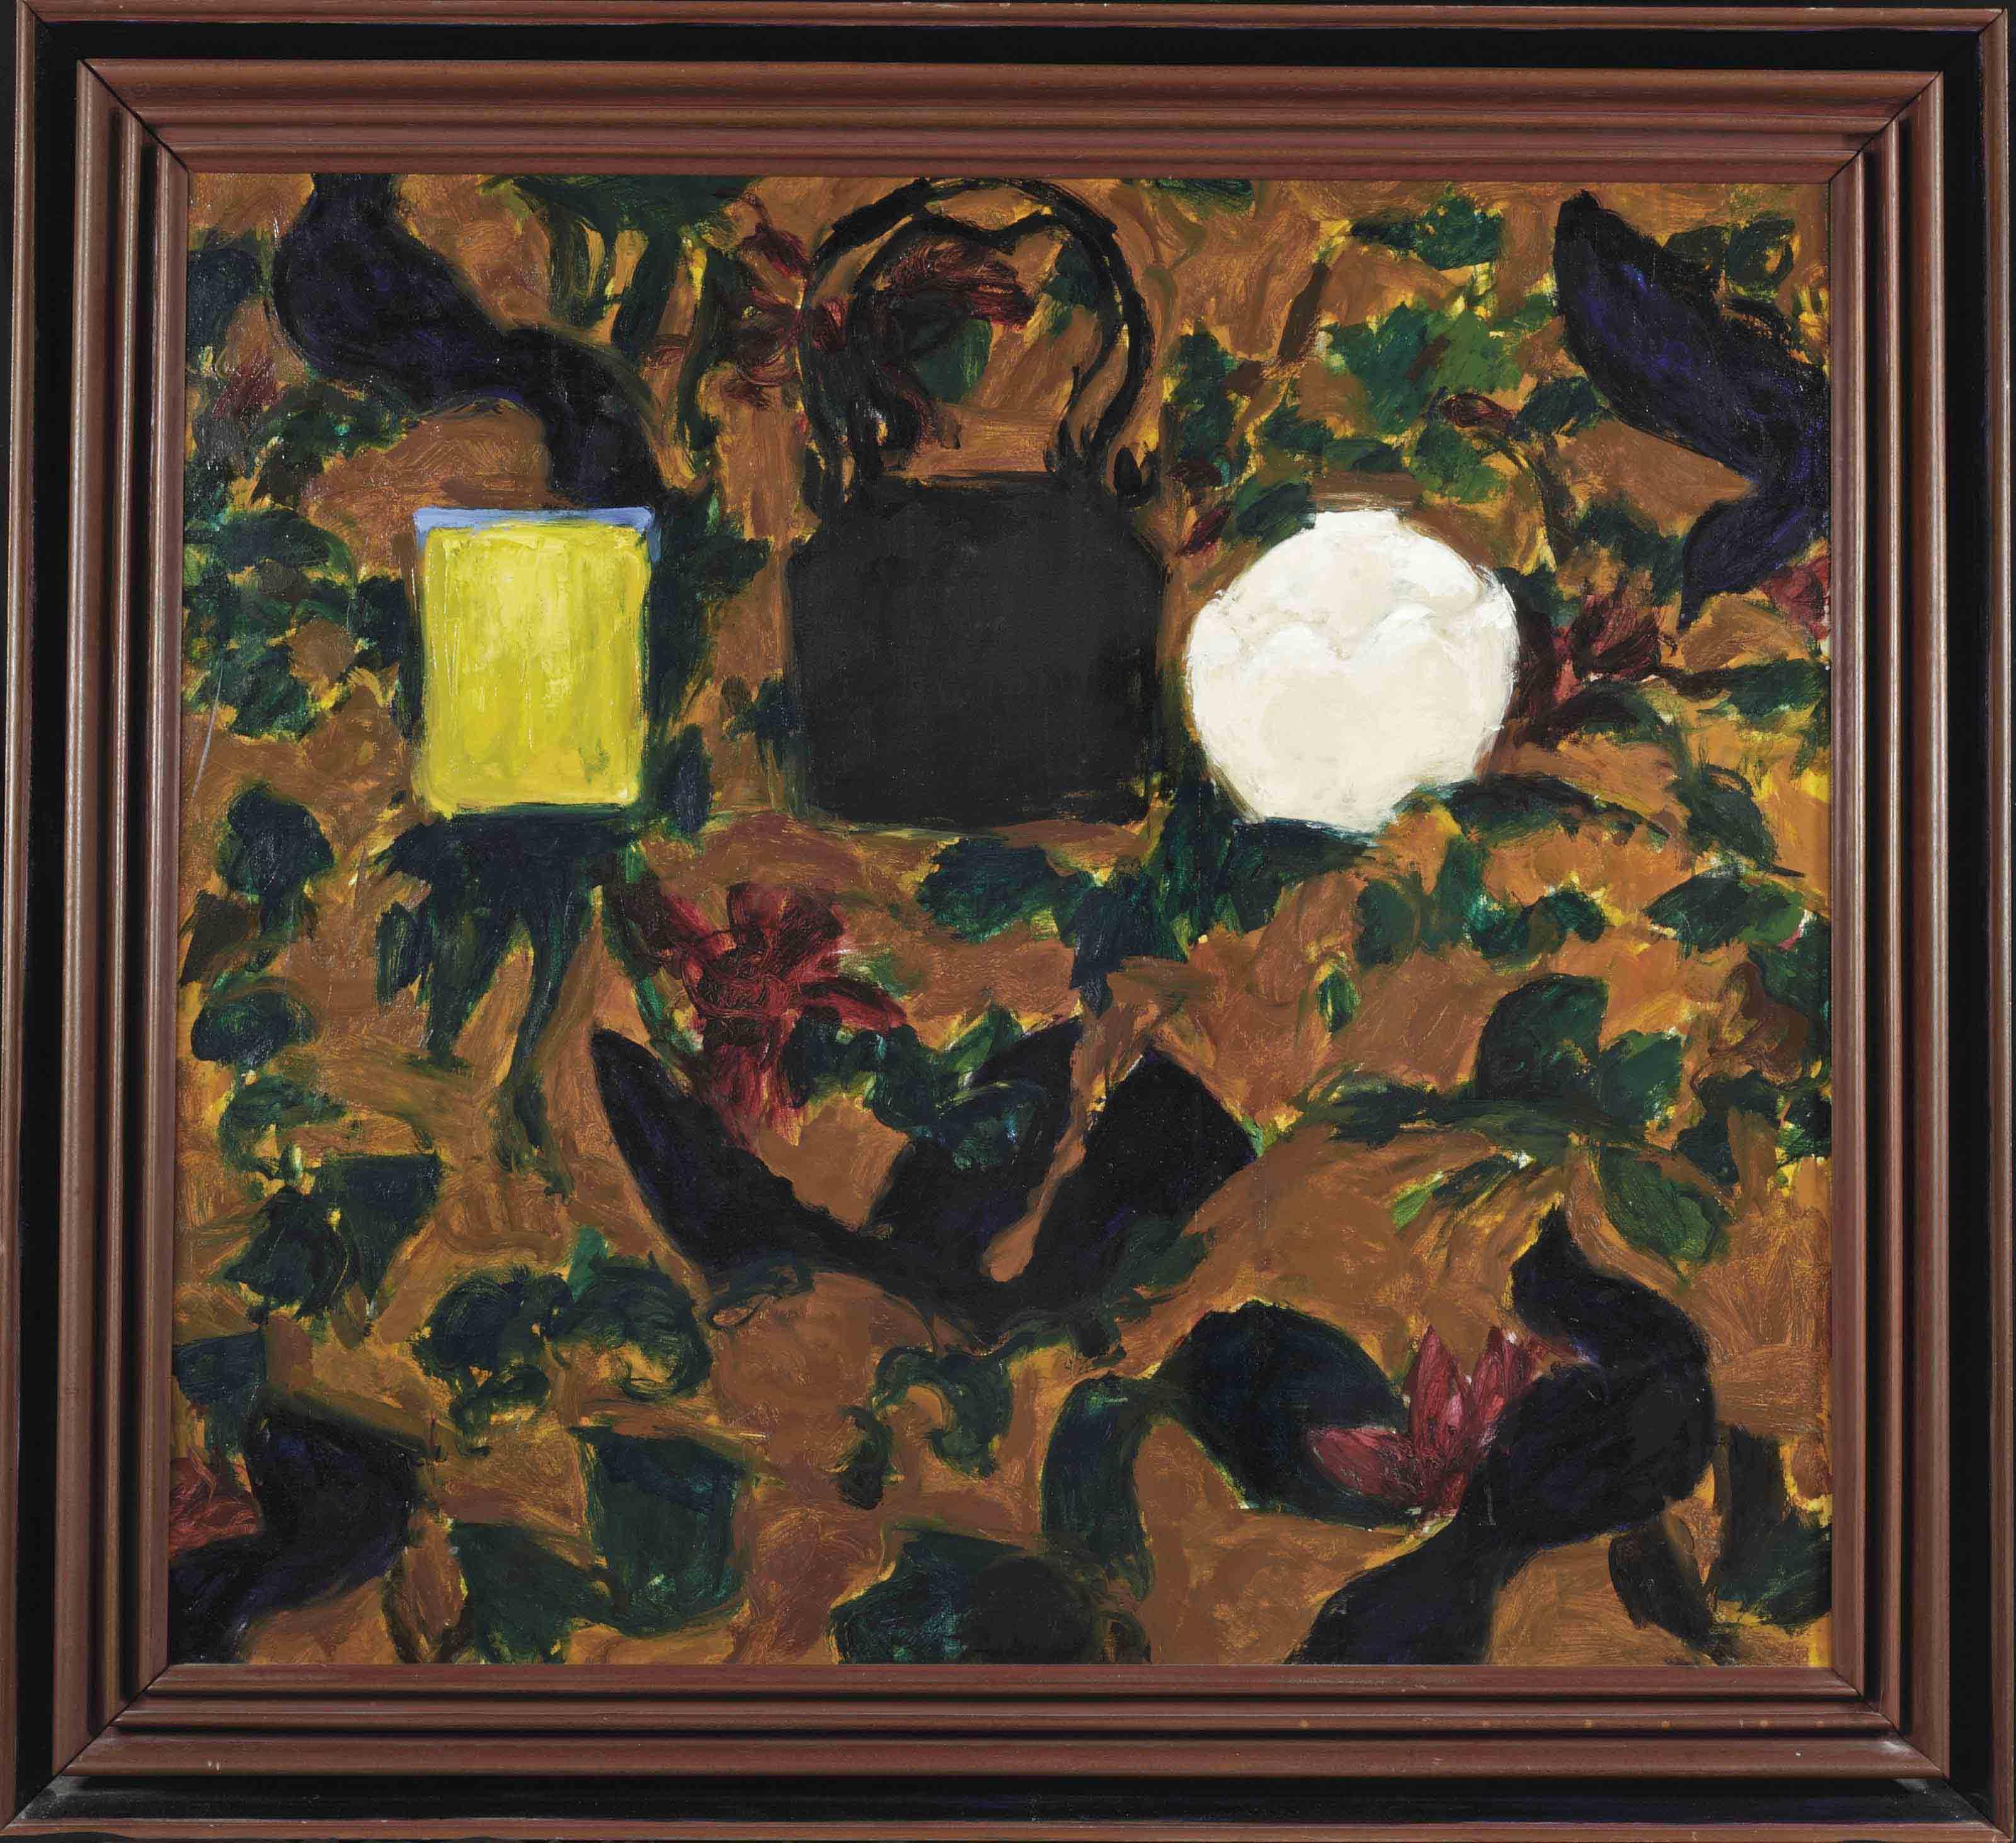 Homage to Soetsu Yanagi, Bernard Leach, and, the unknown craftsman